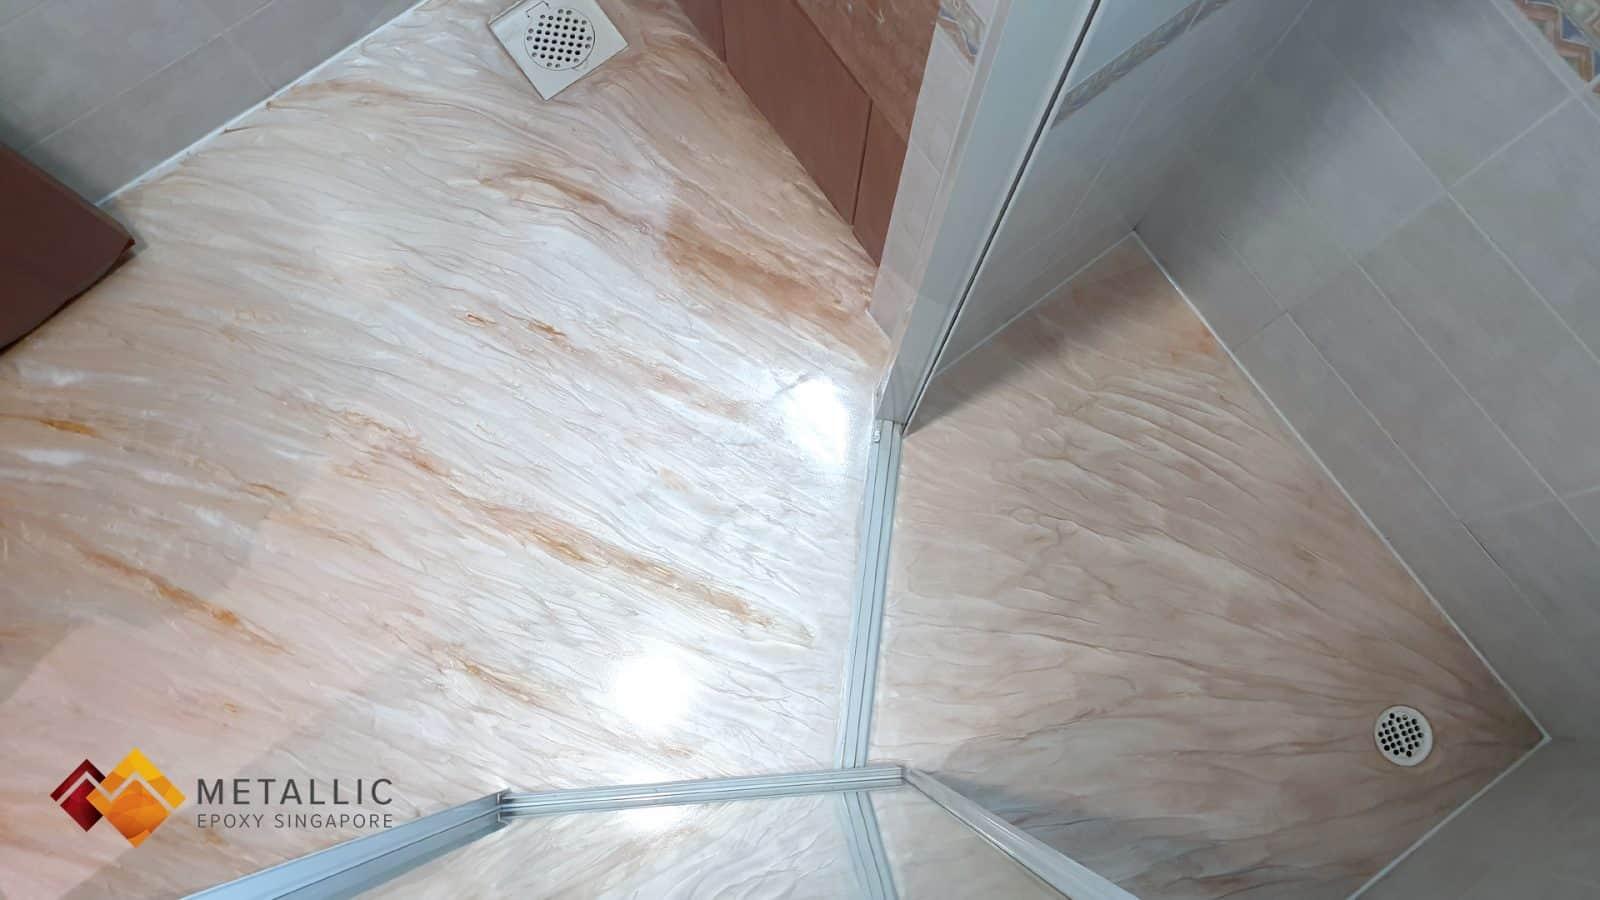 metallic epoxy singapore orange wood bathroom floor